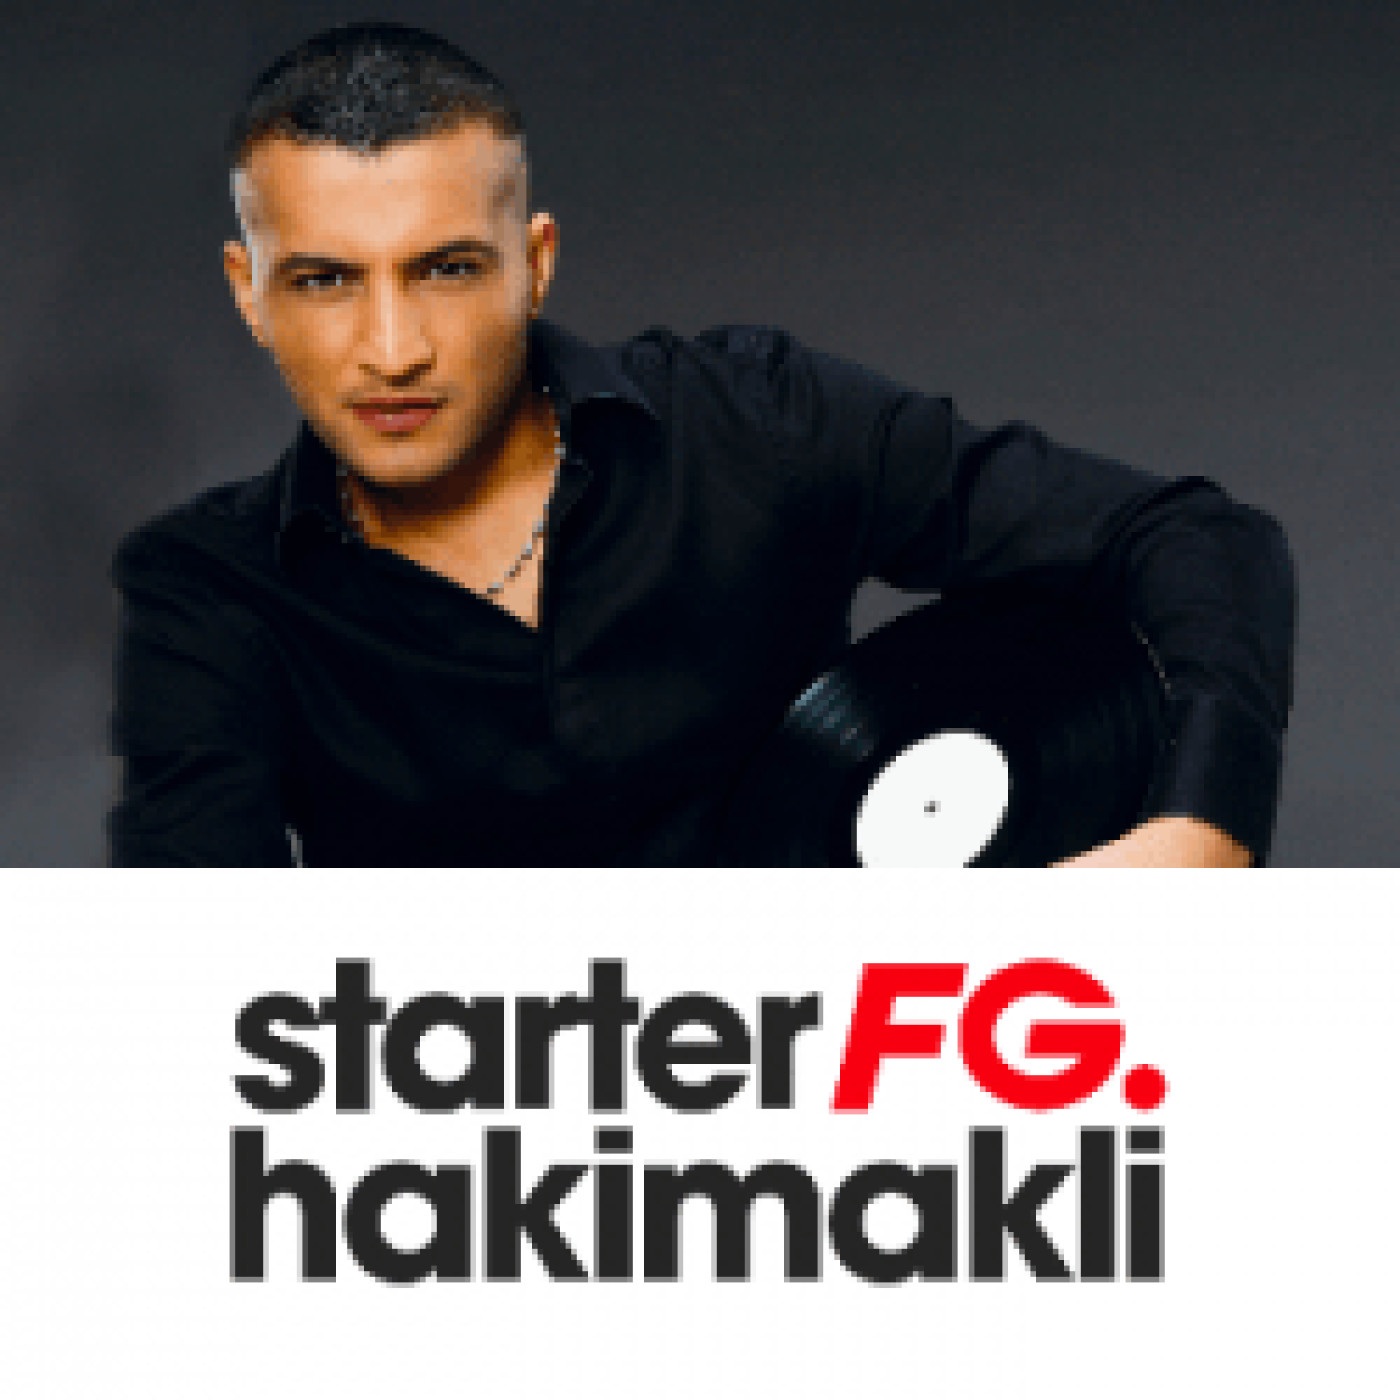 STARTER FG BY HAKIMAKLI MERCREDI 16 SEPTEMBRE 2020